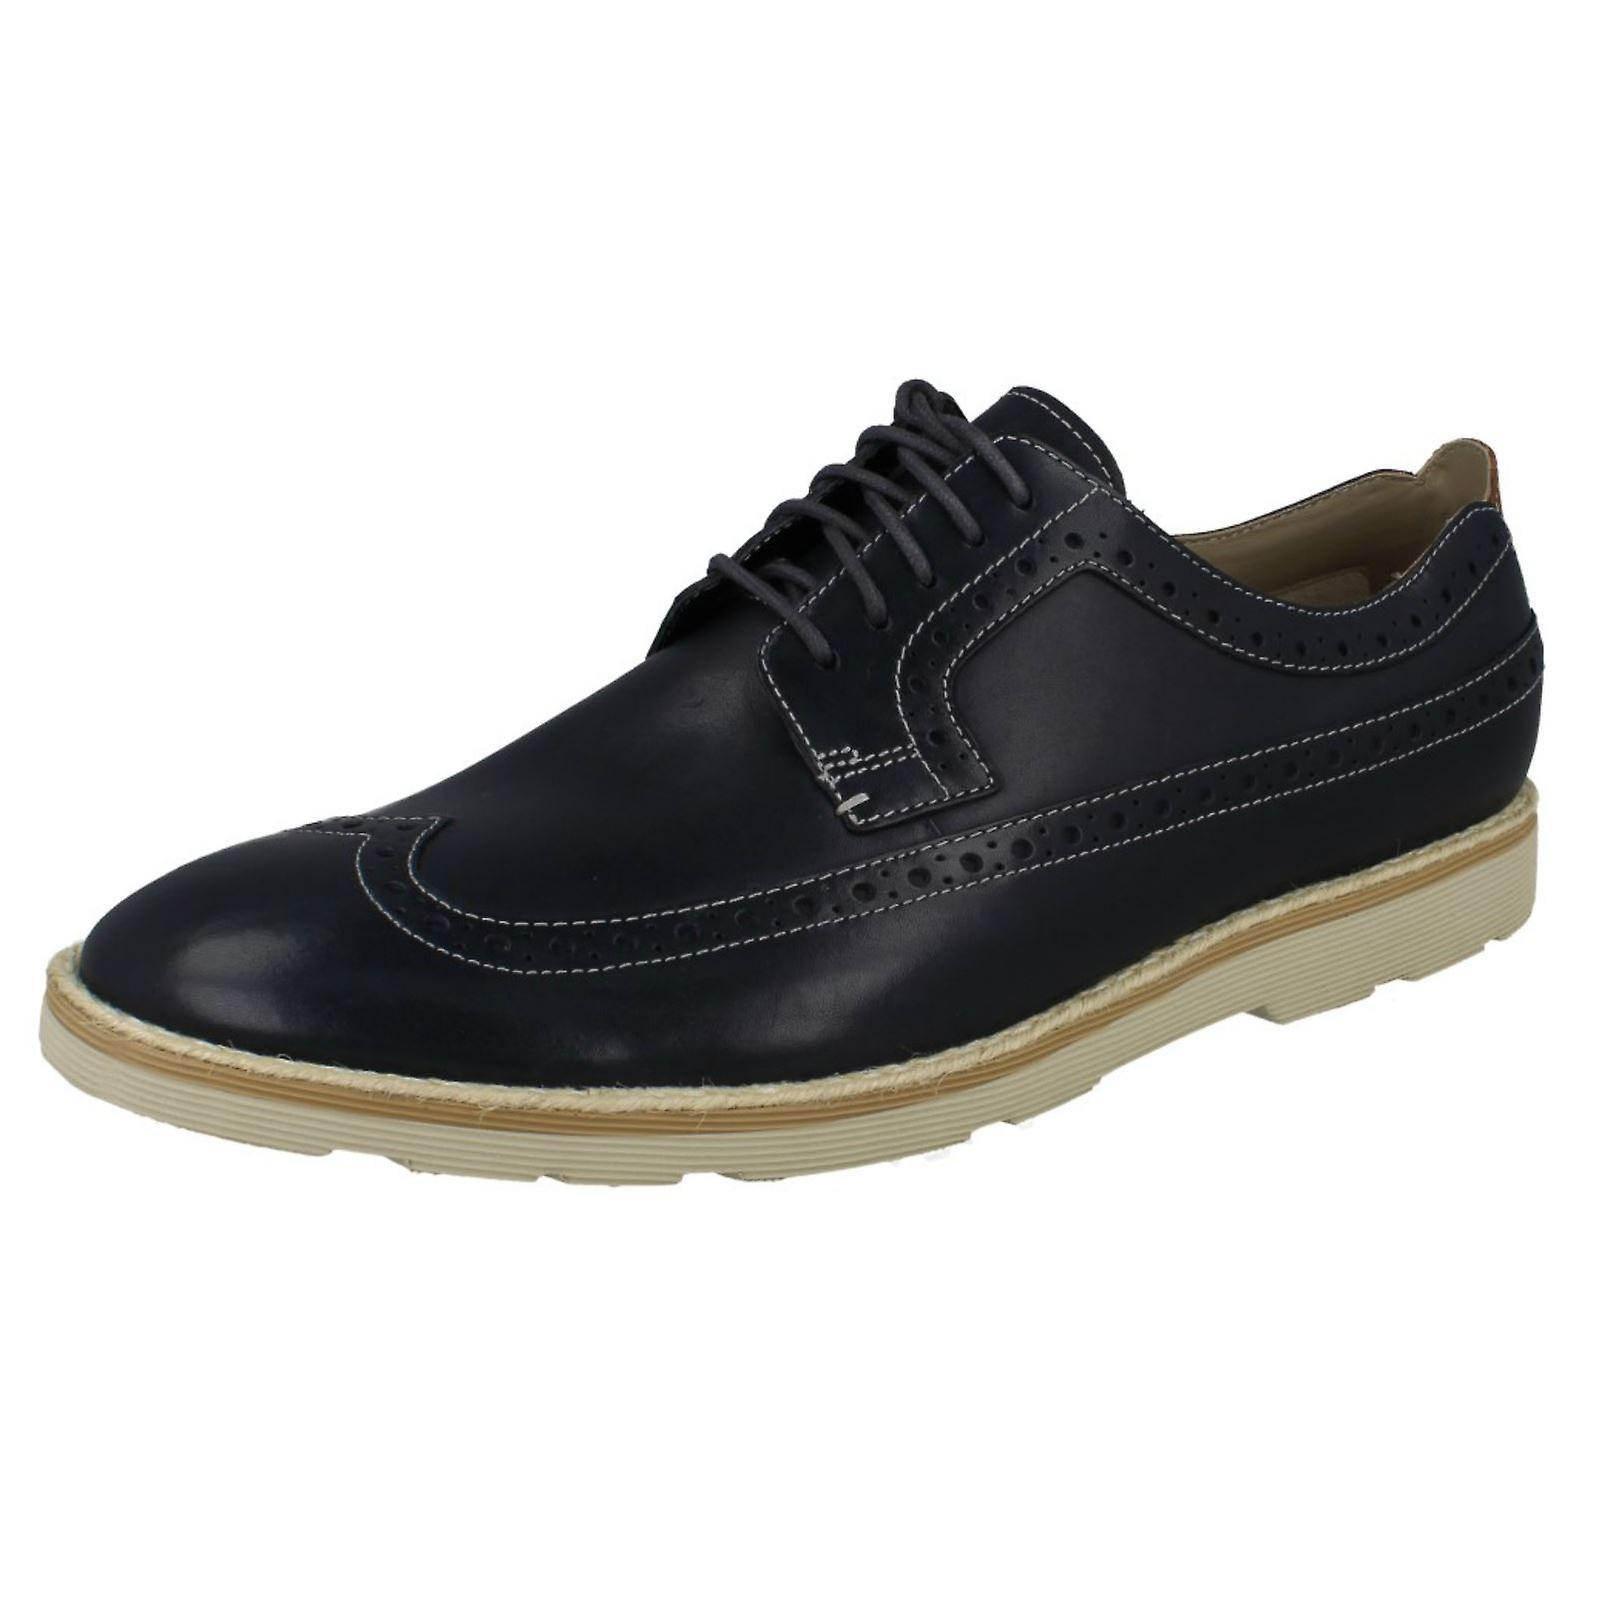 Mens Clarks Smart Casual scarpe Gambeson Limit   Nuovo 2019    Gentiluomo/Signora Scarpa